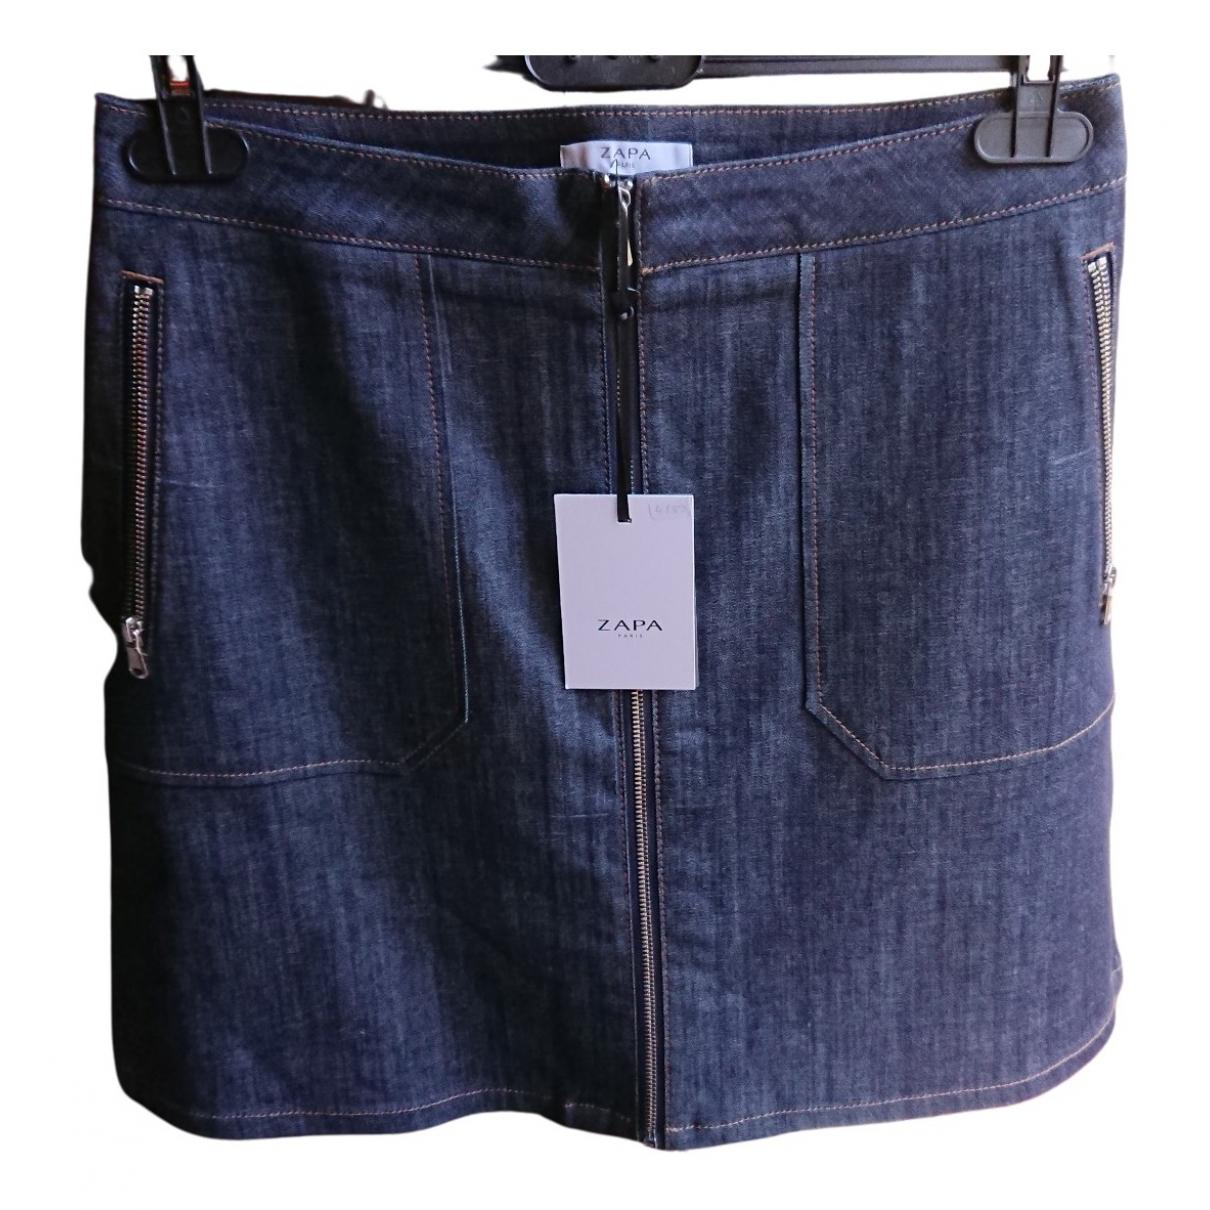 Zapa - Jupe   pour femme en coton - bleu